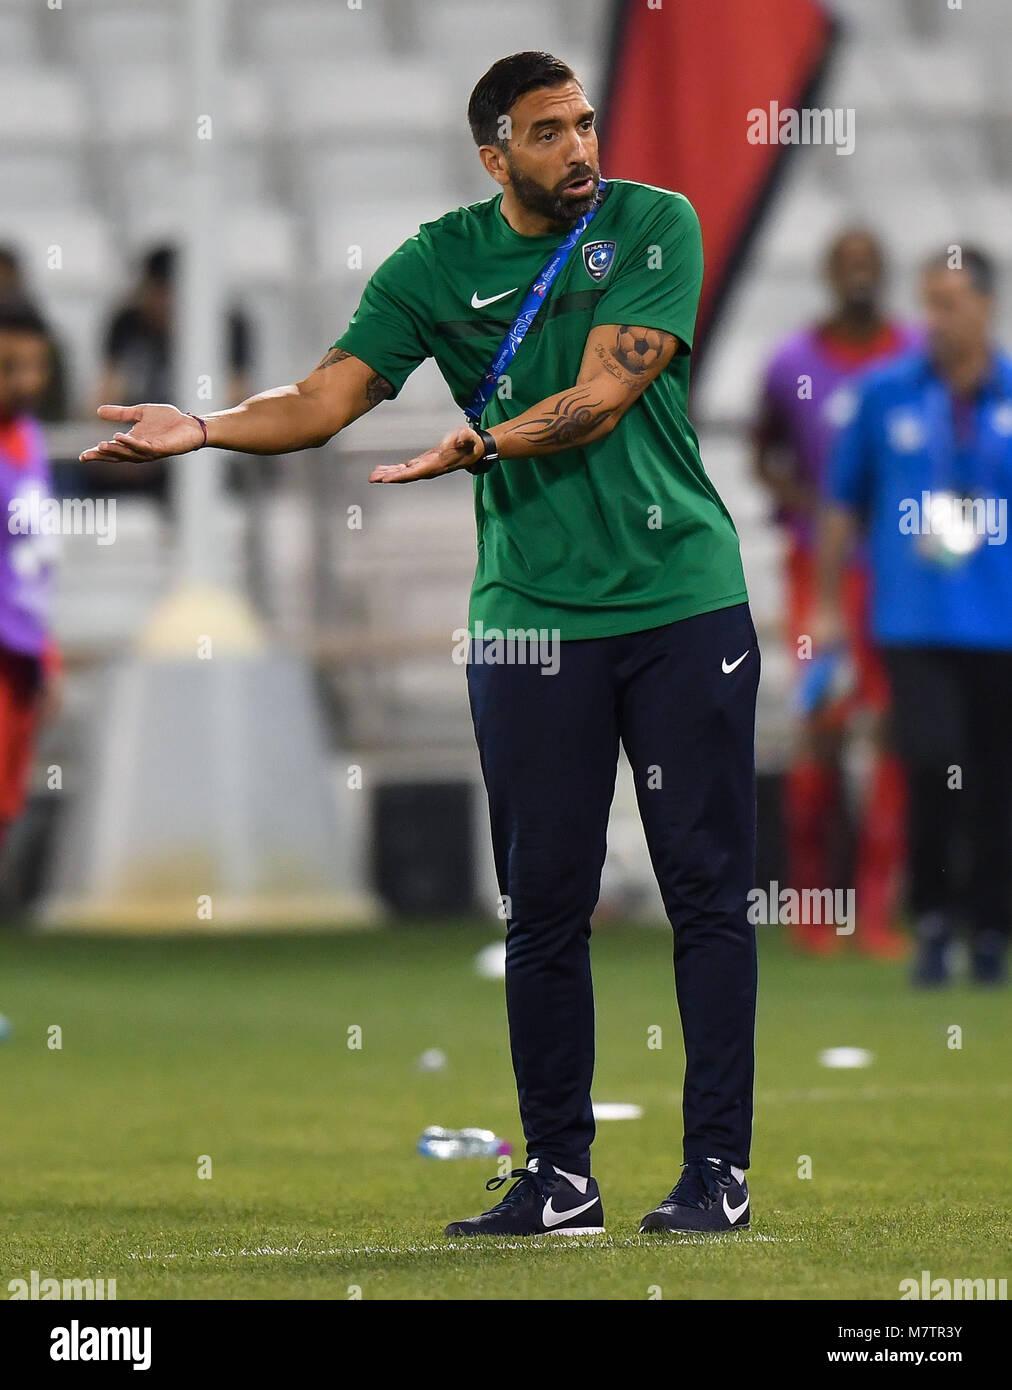 (180313) -- DOHA, March 13, 2018 (Xinhua) -- Al-Hilal's head coach Juan Ignacio Brown reacts during the AFC Champions Stock Photo